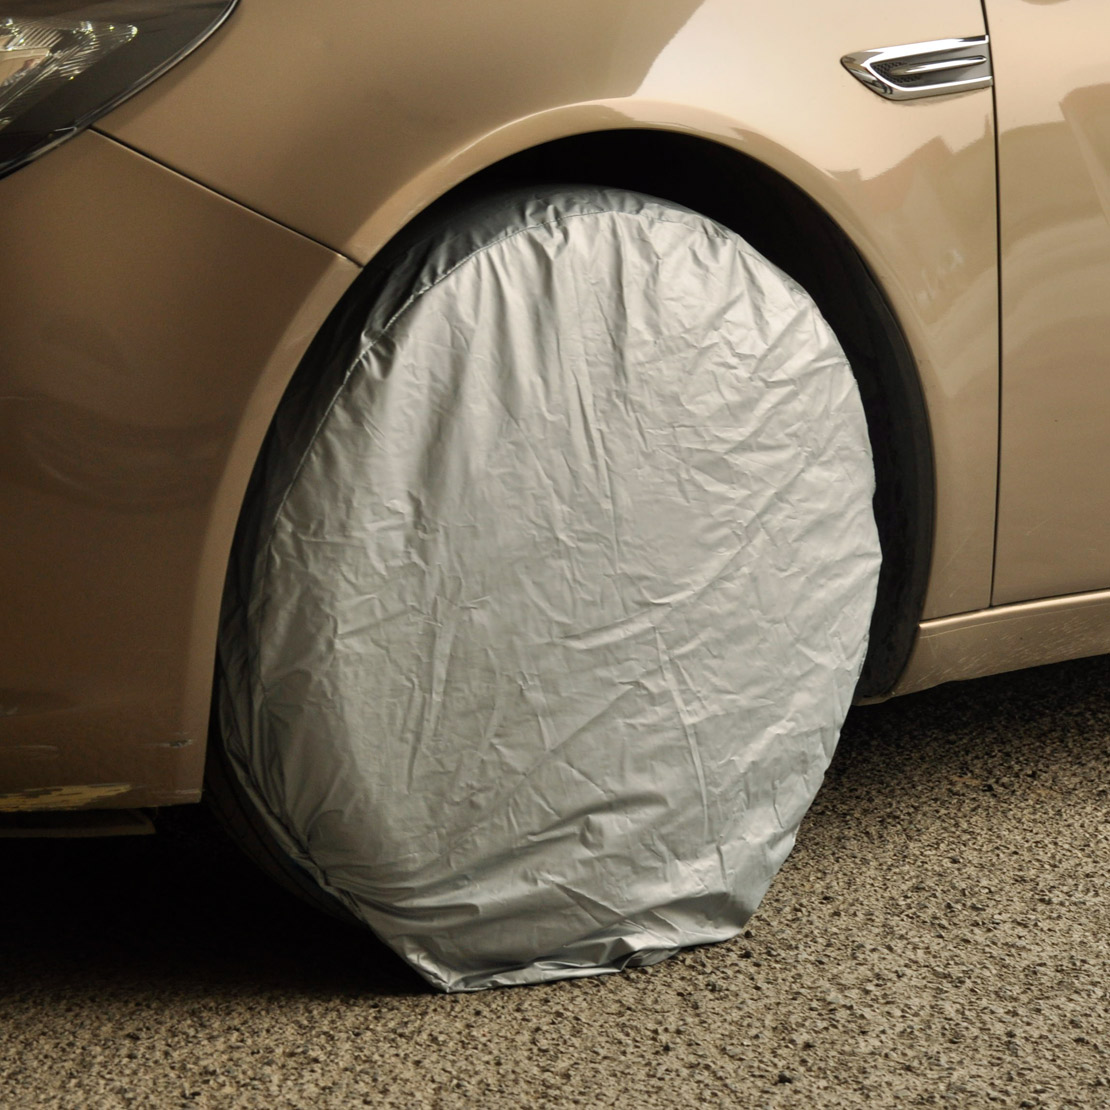 Beler 4X колеса шин Водонепроницаемый пыли Защитная крышка для VW Ford Audi Mazda Toyota Kia Chevrolet BMW Mercedes -Benz